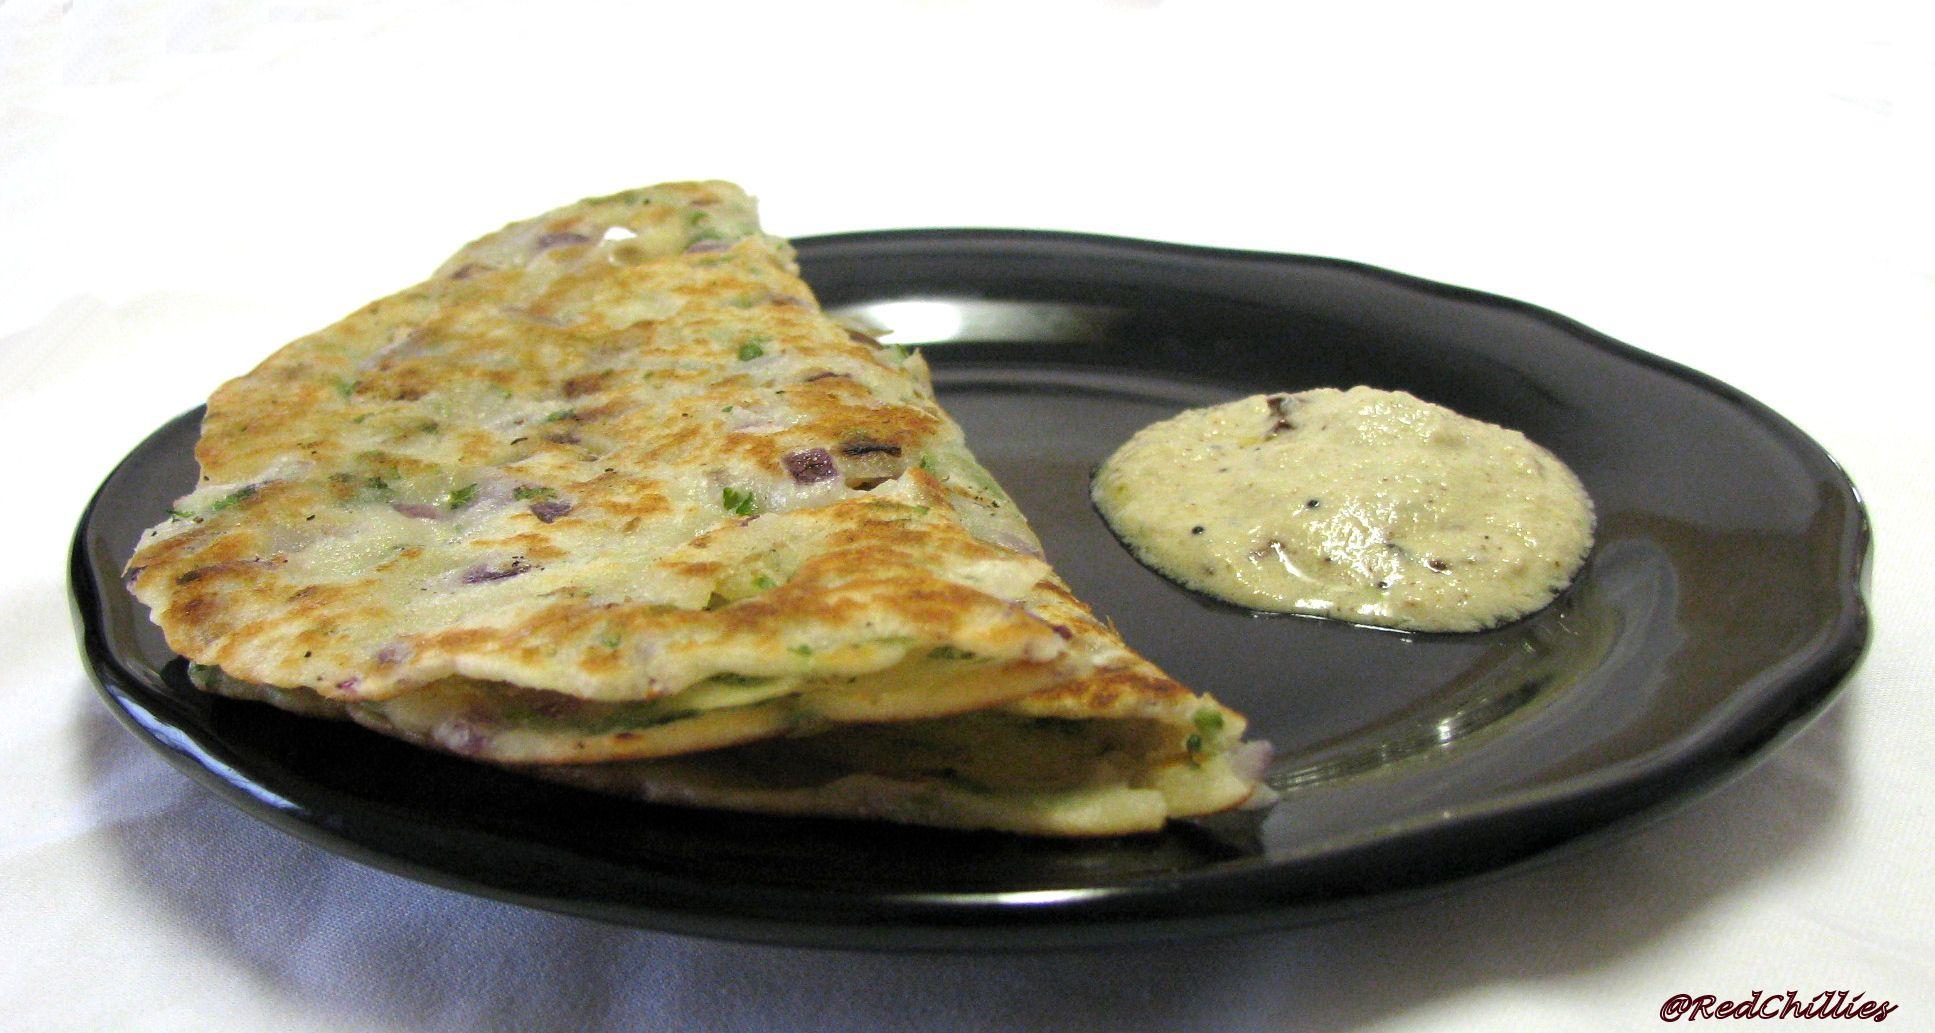 Veg Cake Recipe In Kannada: Akki Rotti / Thalipeeth And Coconut Chutney